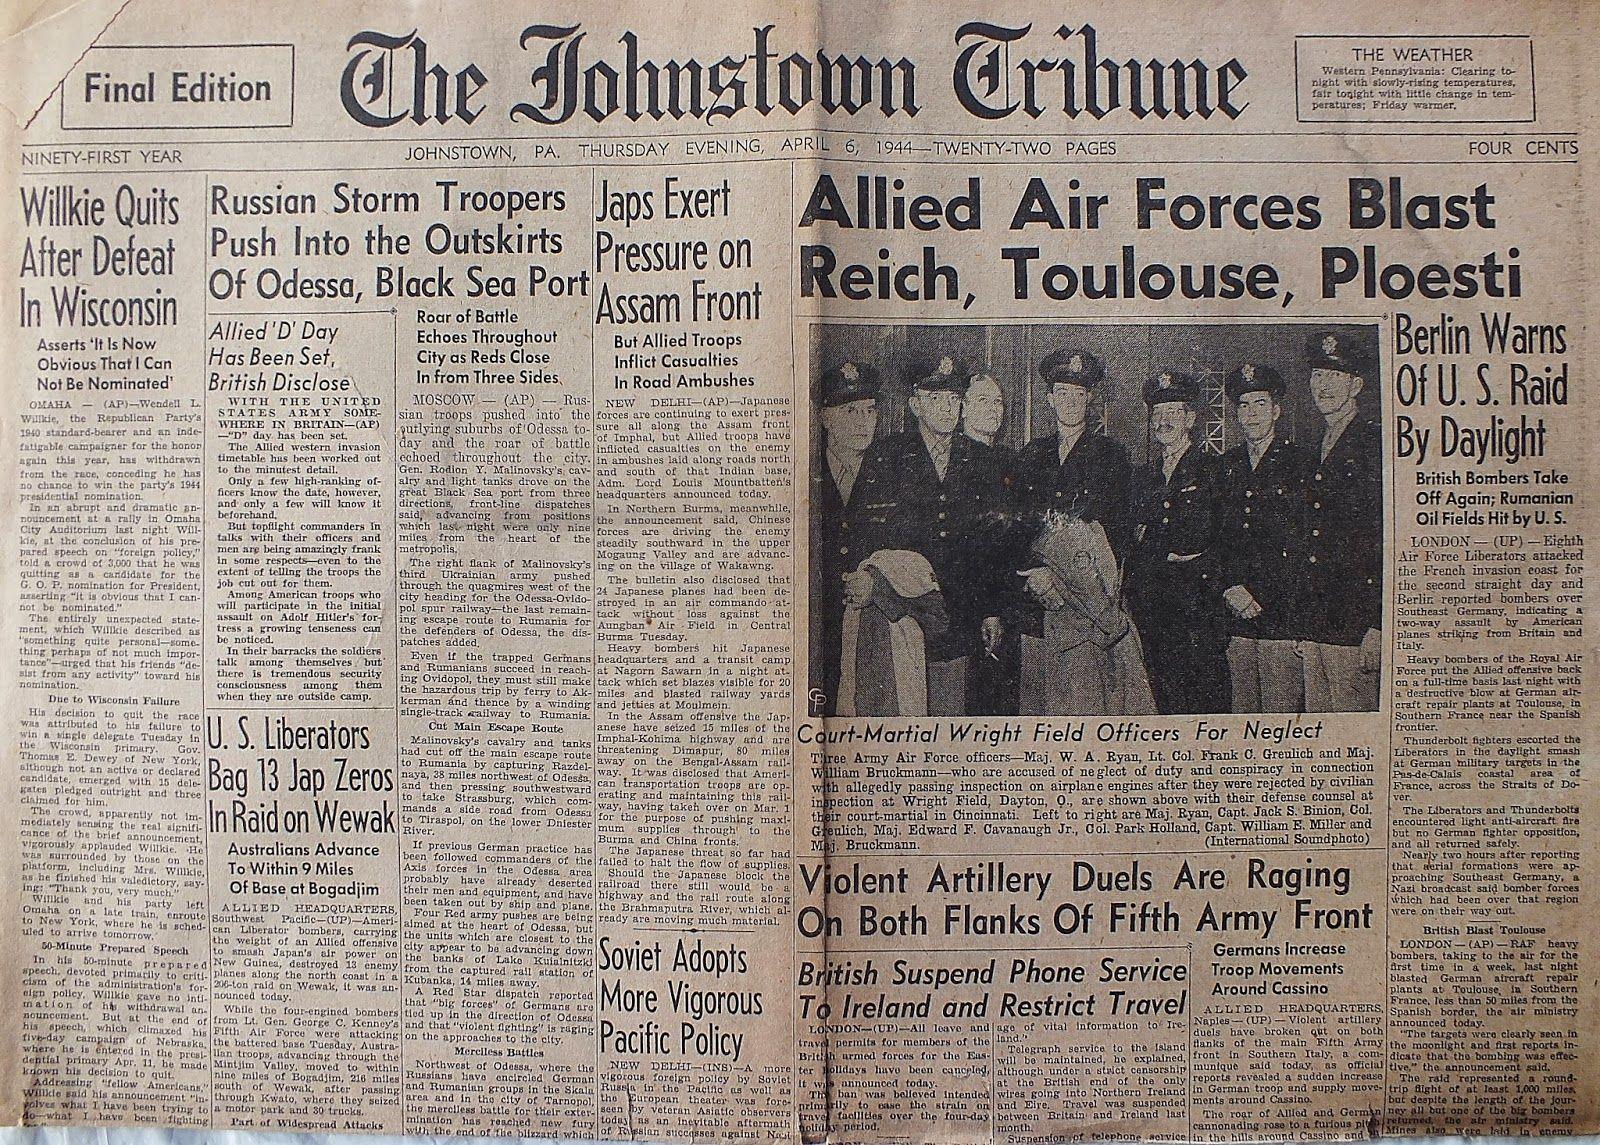 The Johnstown Tribune - World War II: April 6, 1944: Allied Air Forces Blast Reich, Toul...